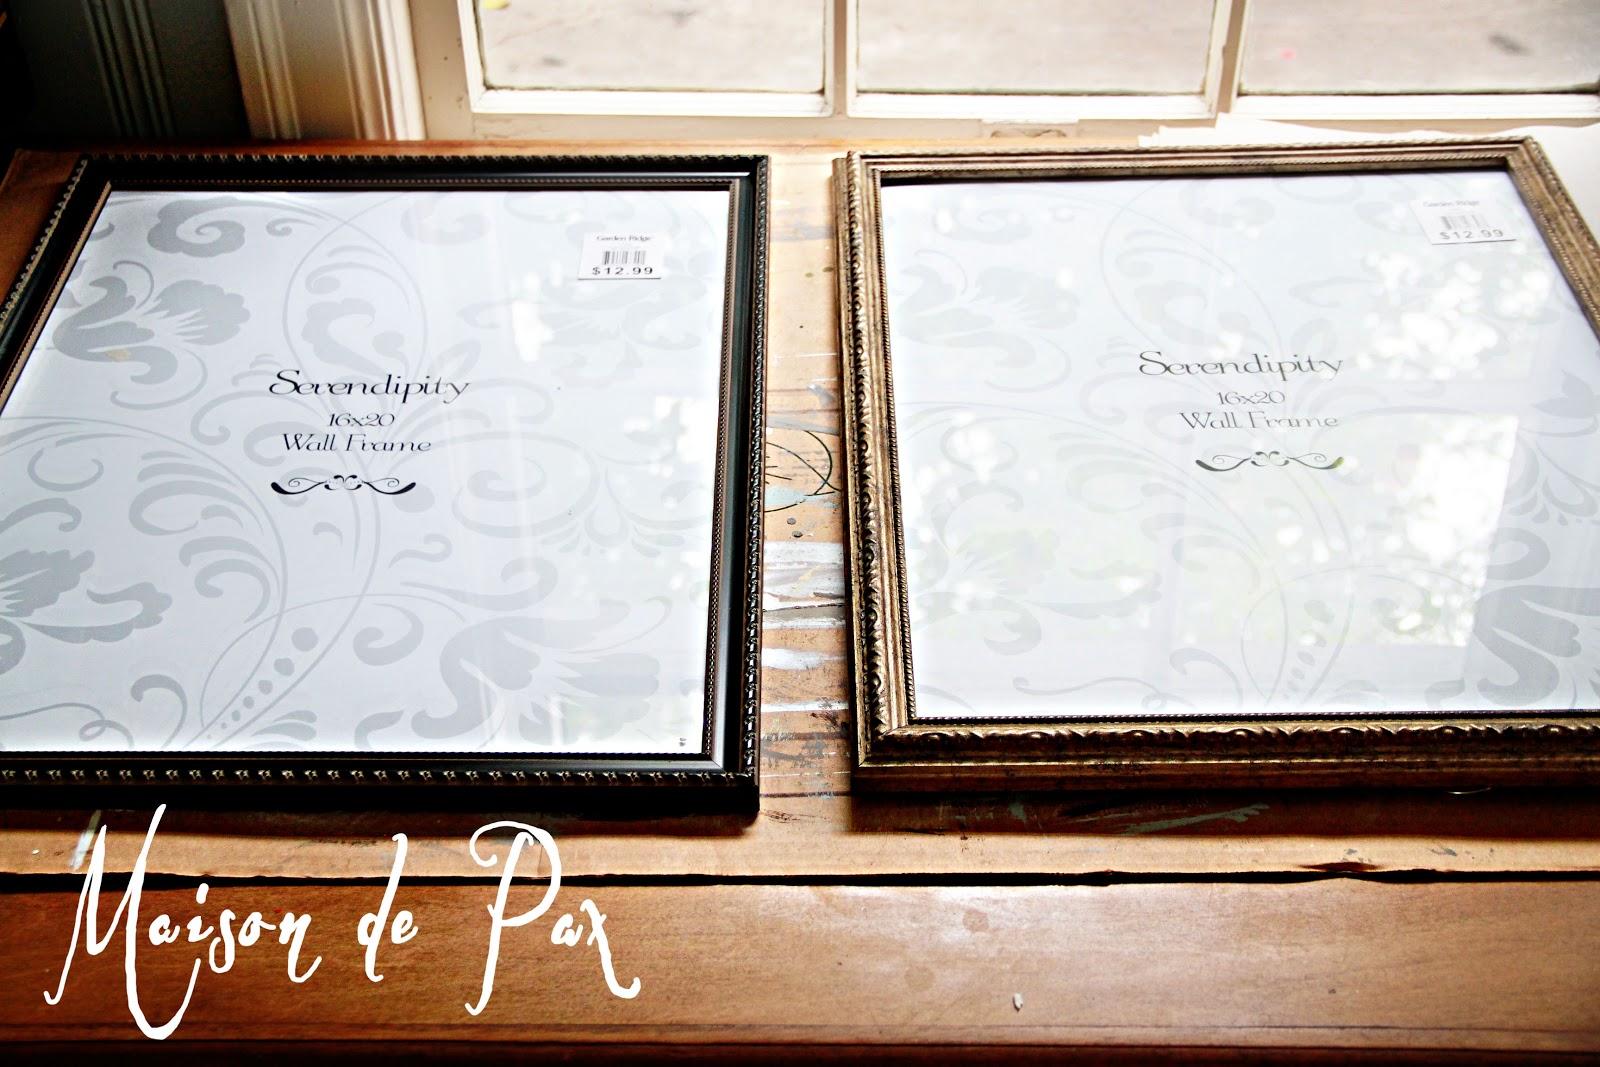 Gilded Frames - Maison de Pax